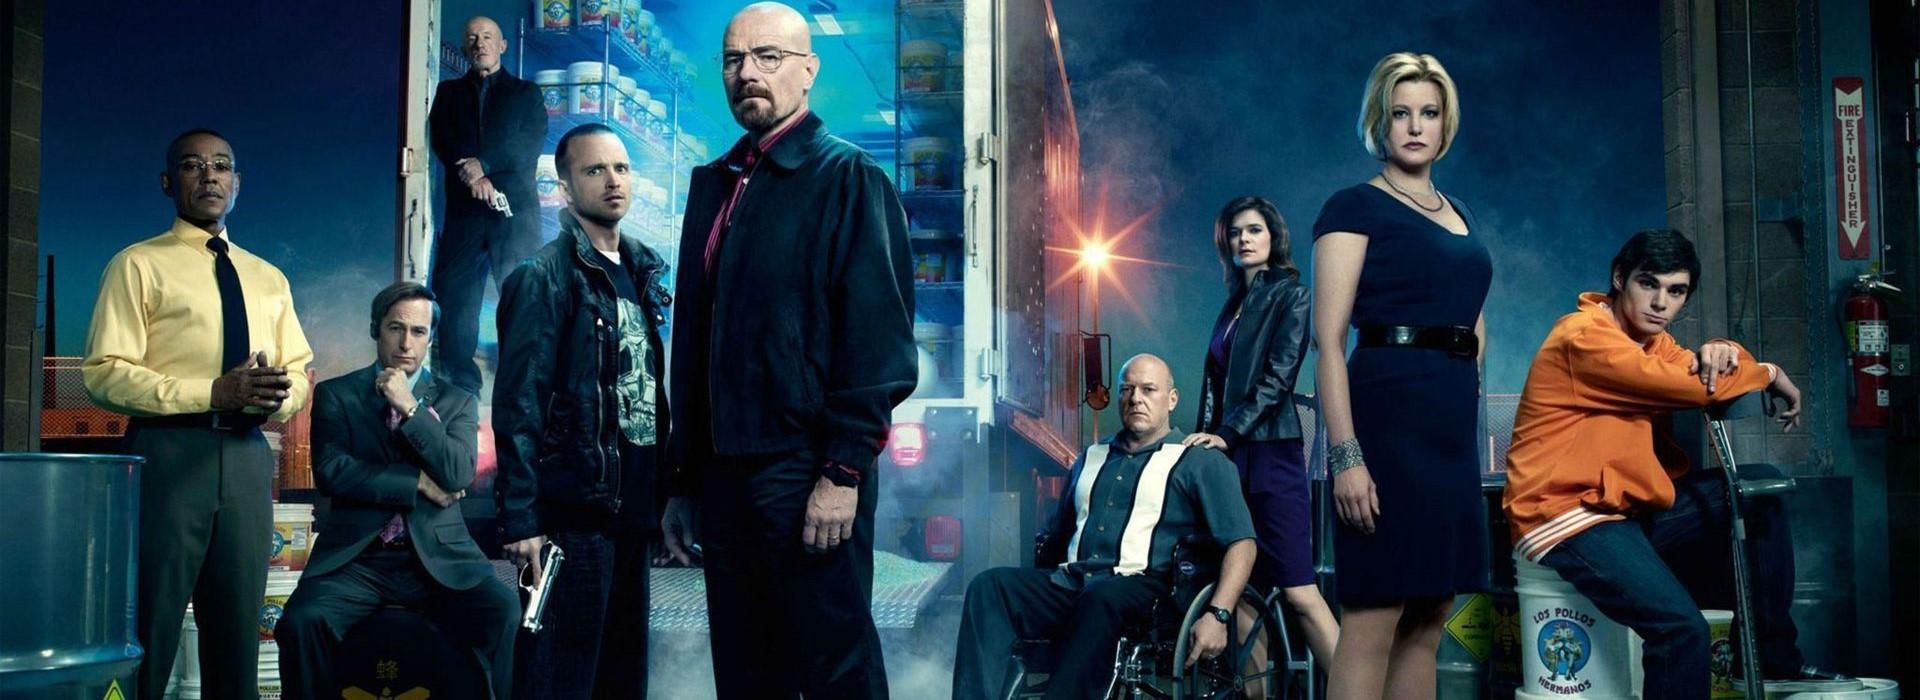 Breaking Bad Season 5 720p cover